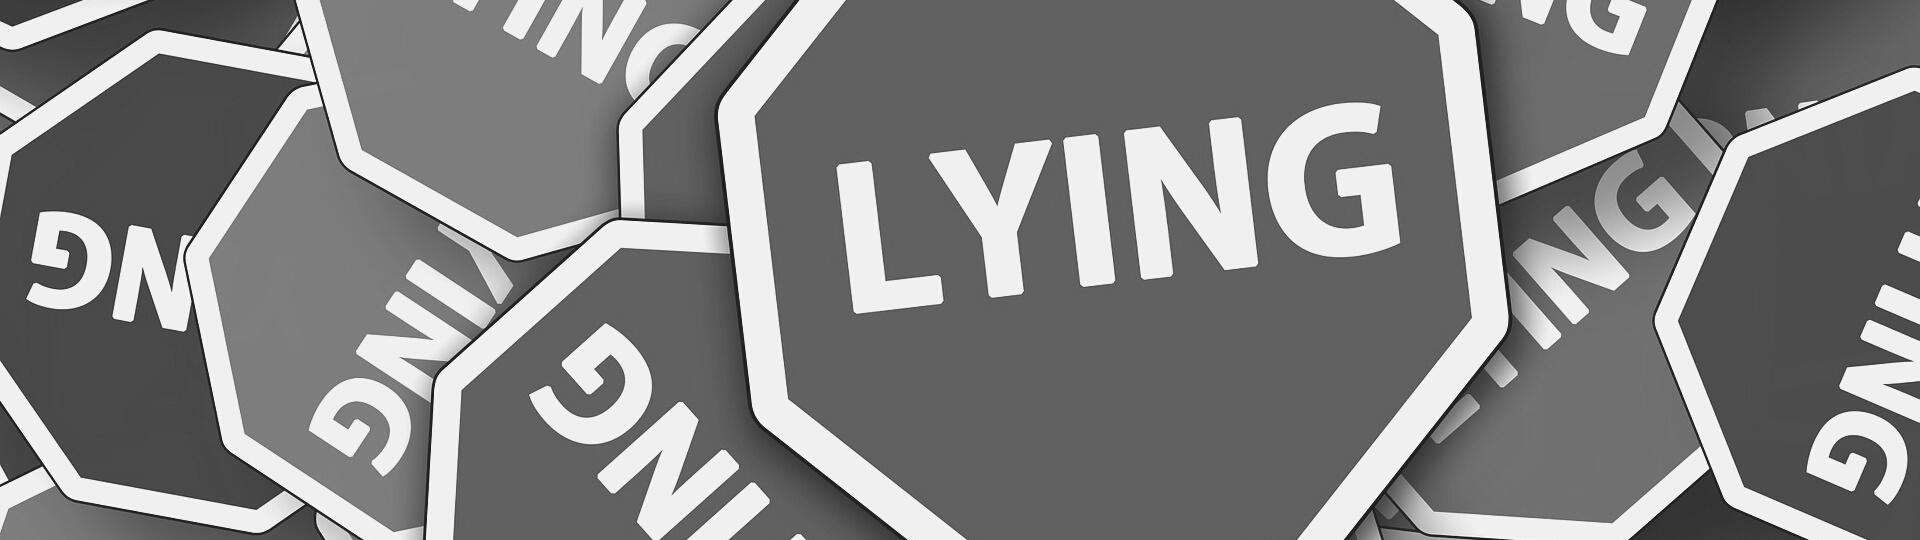 lying recruitment